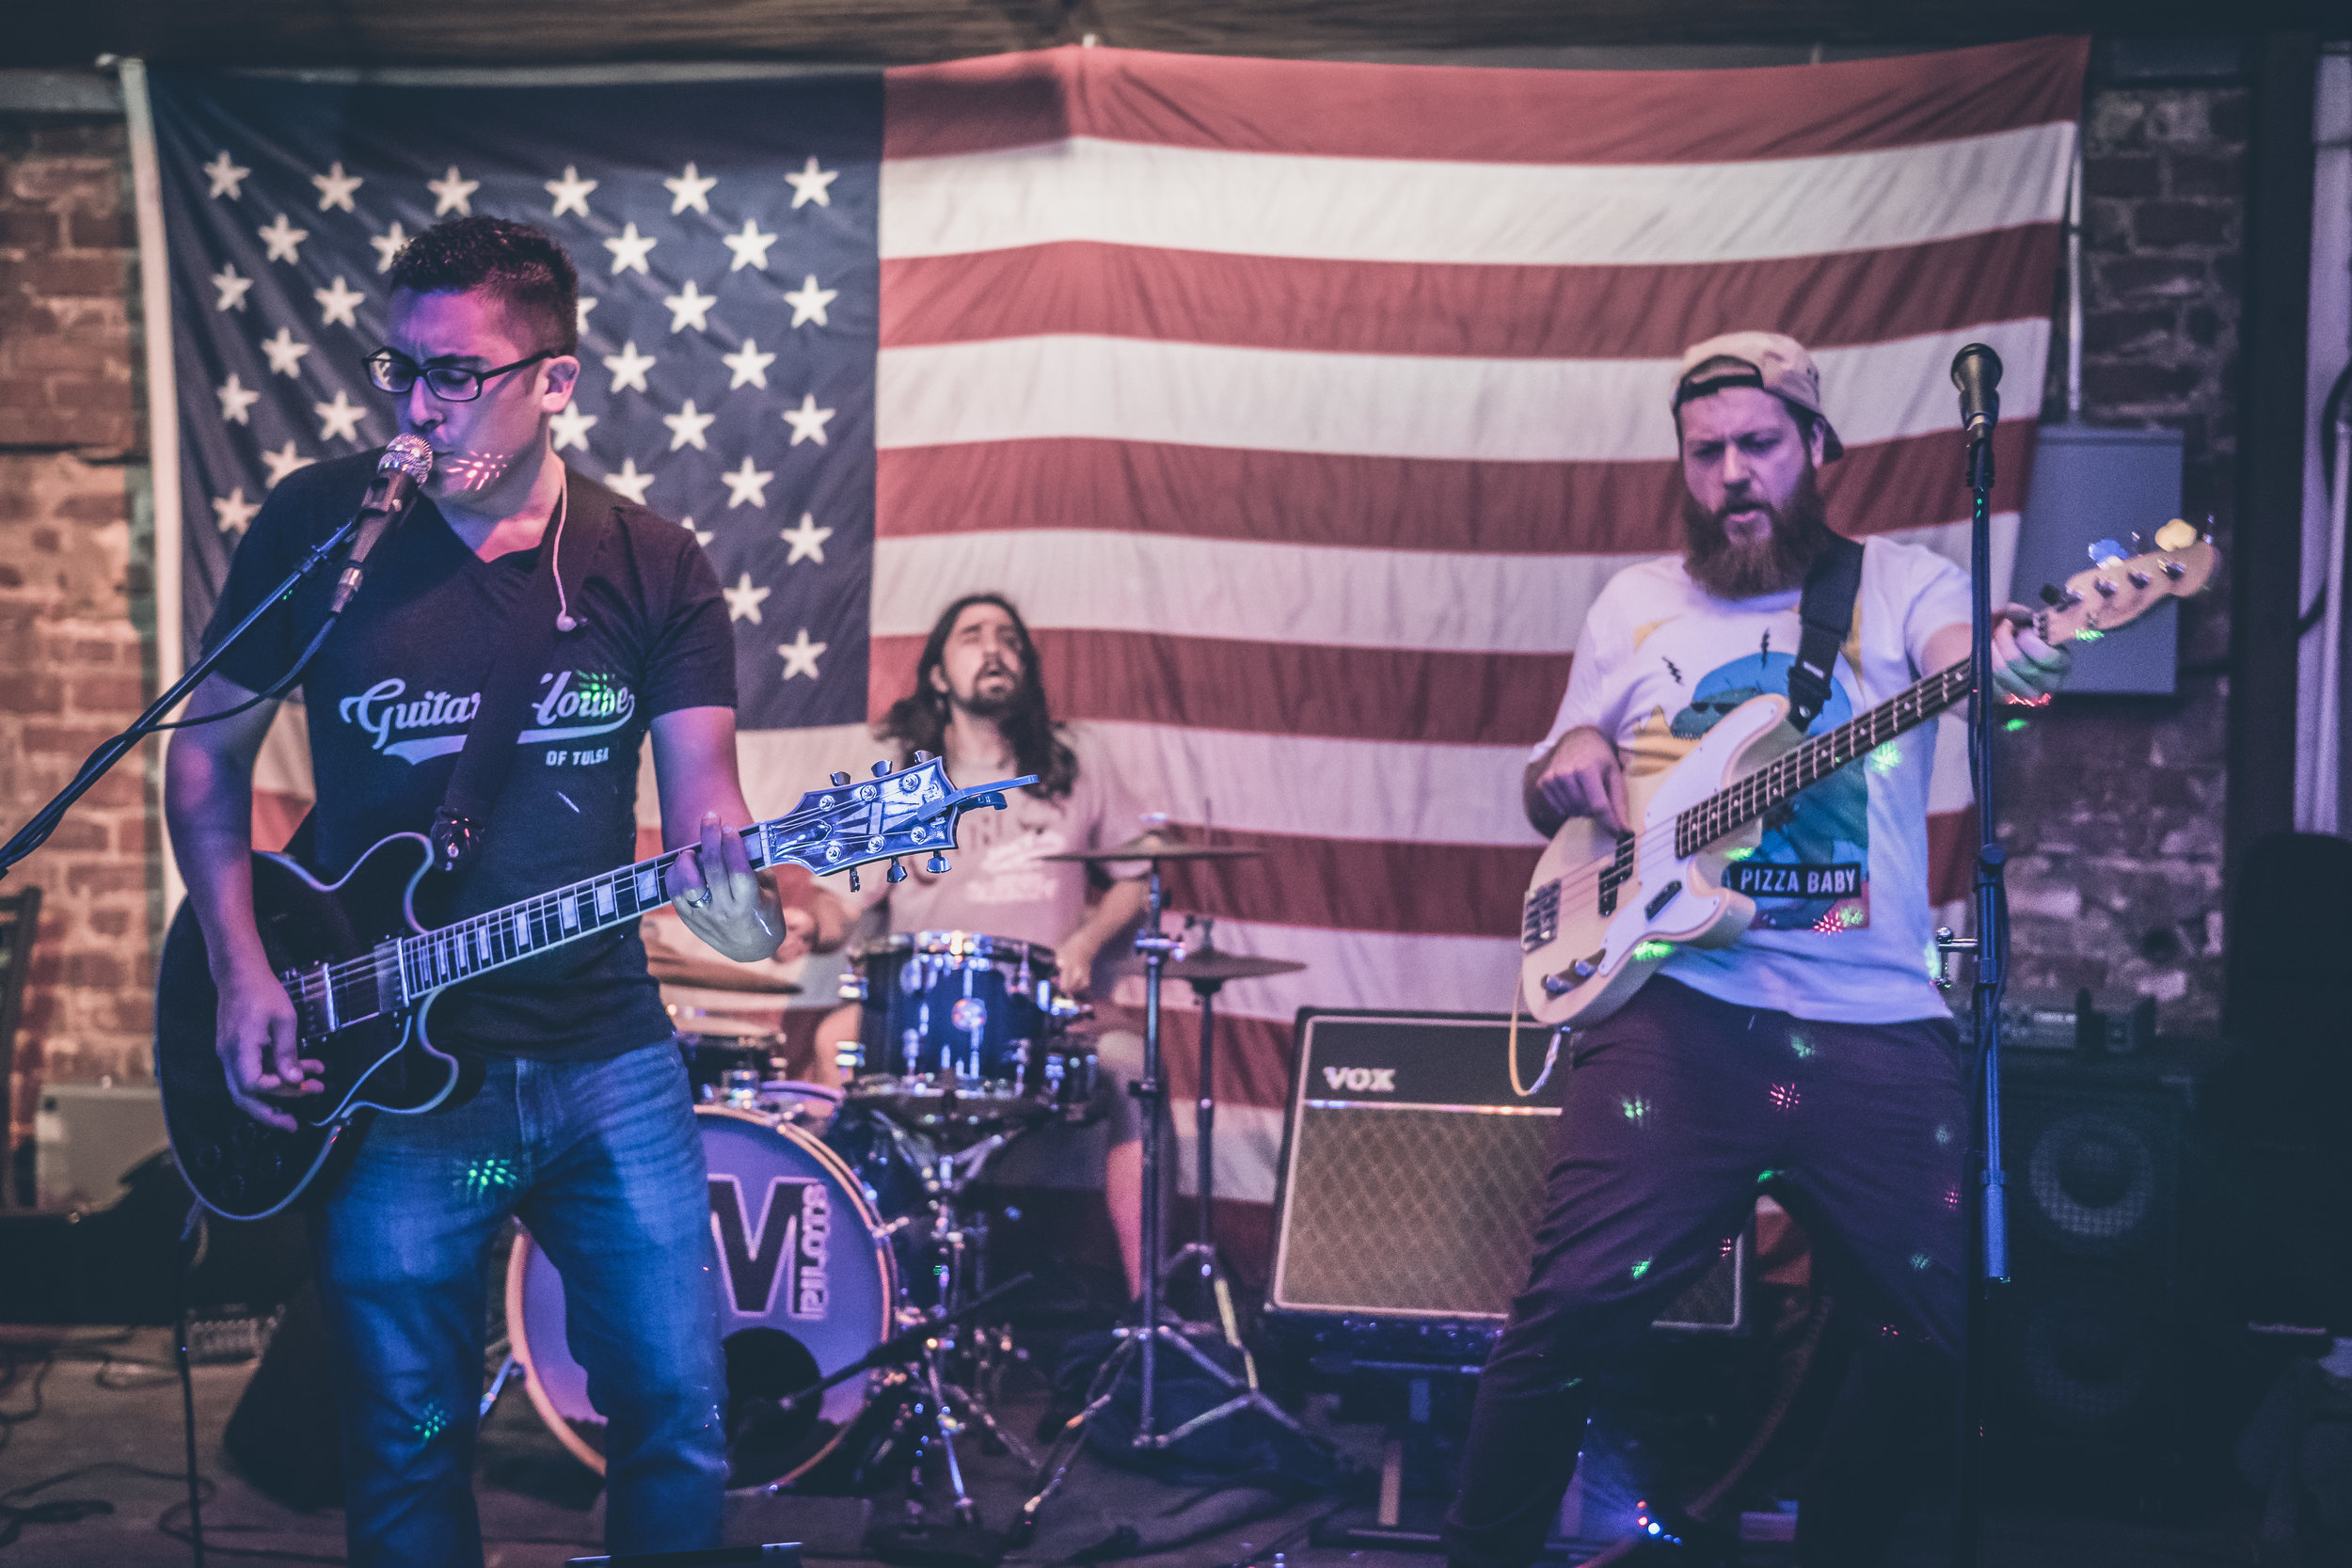 FM Pilots - Tulsa Rock Band - The Hunt Club Tulsa, OK 061016-4.jpg